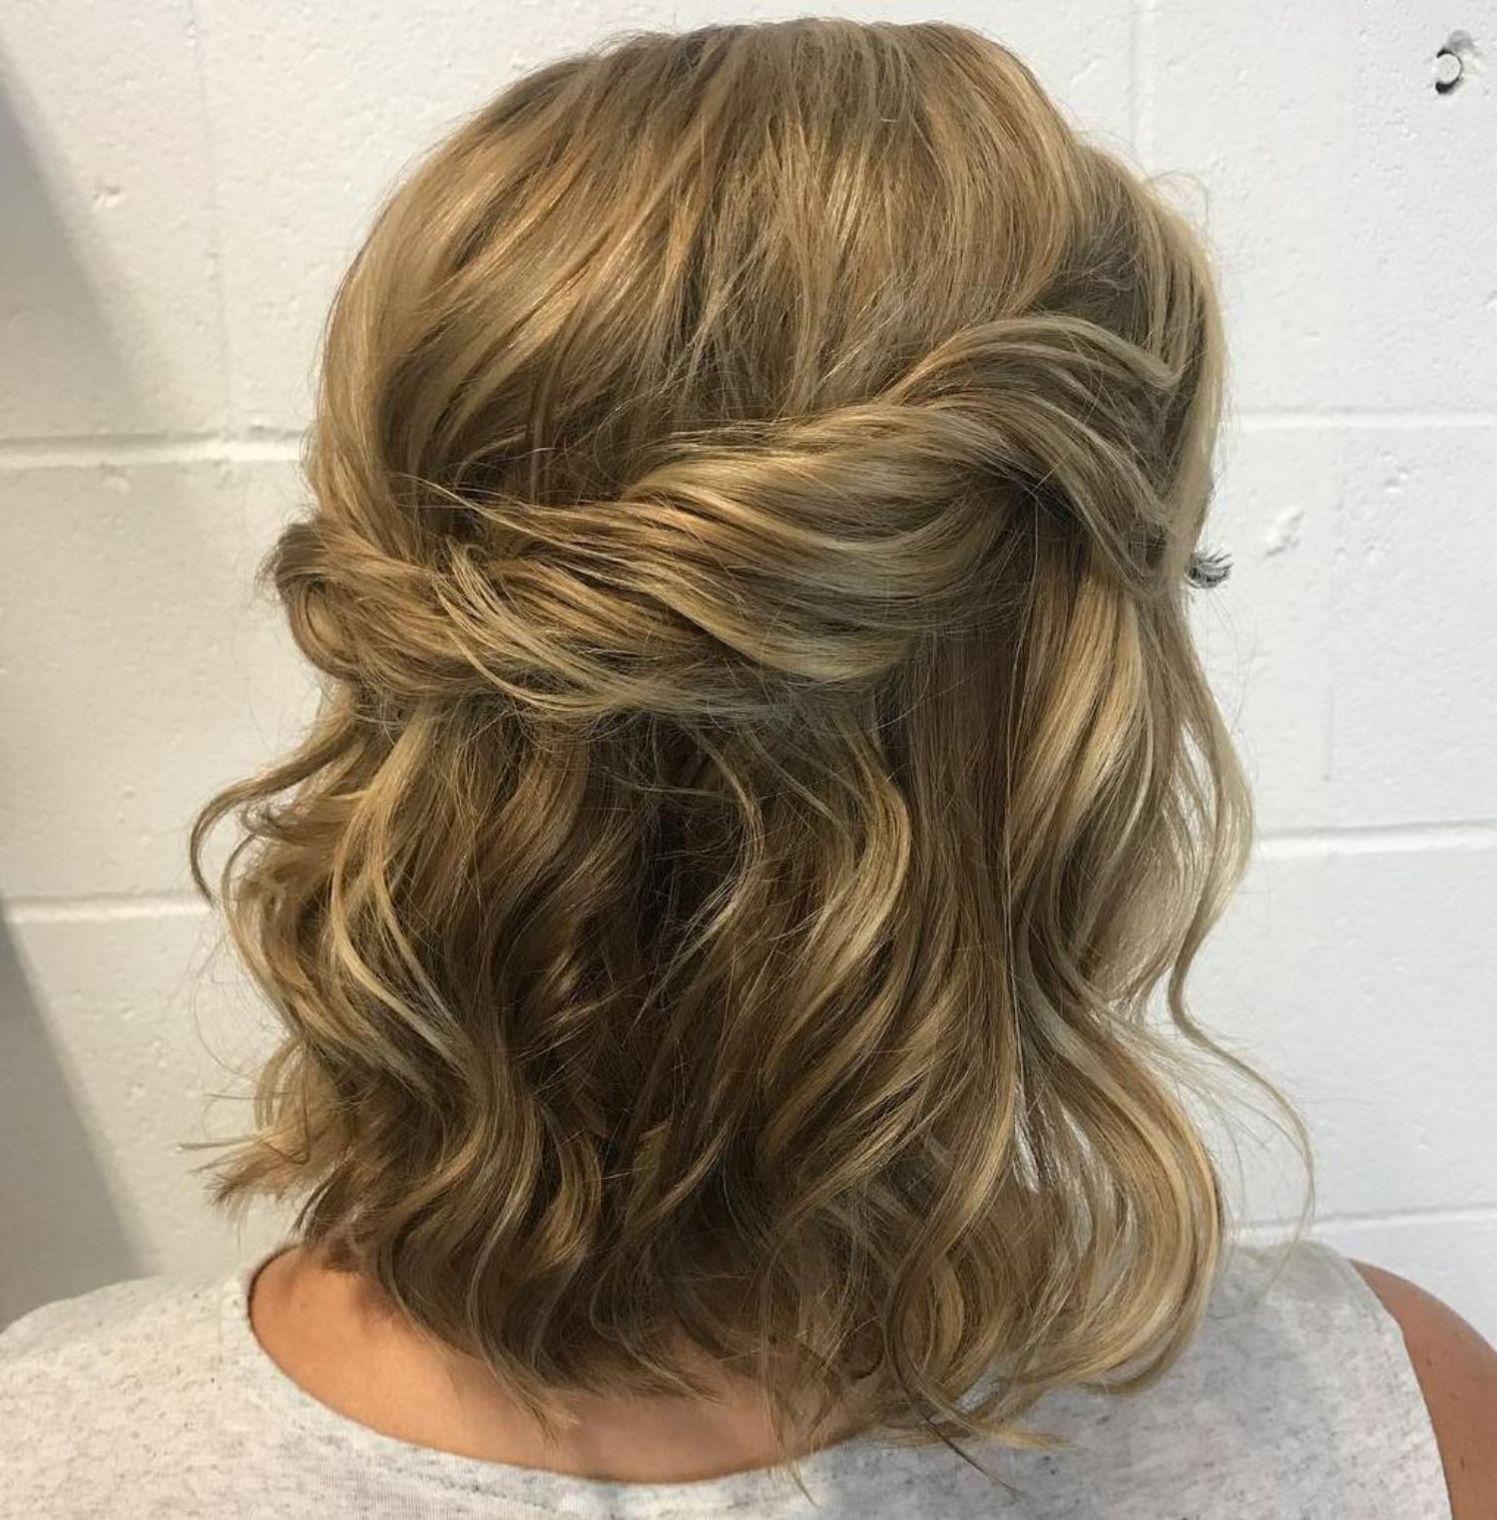 60 Trendiest Updos For Medium Length Hair Medium Length Hair Styles Hair Styles Updos For Medium Length Hair